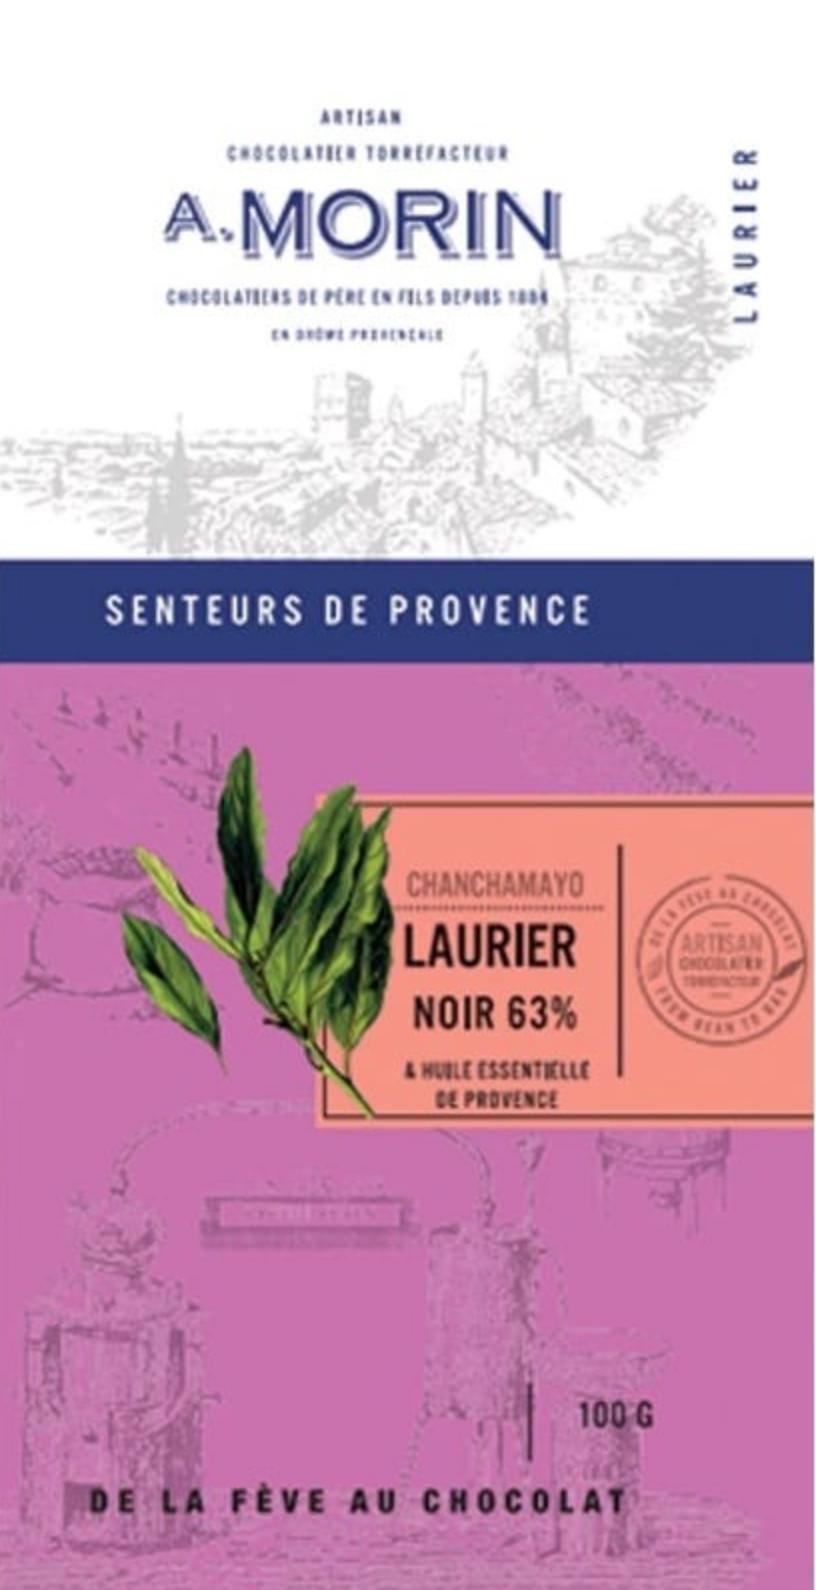 A. MORIN   Schokolade & Lorbeer Chanchamayo »Laurier« 63%